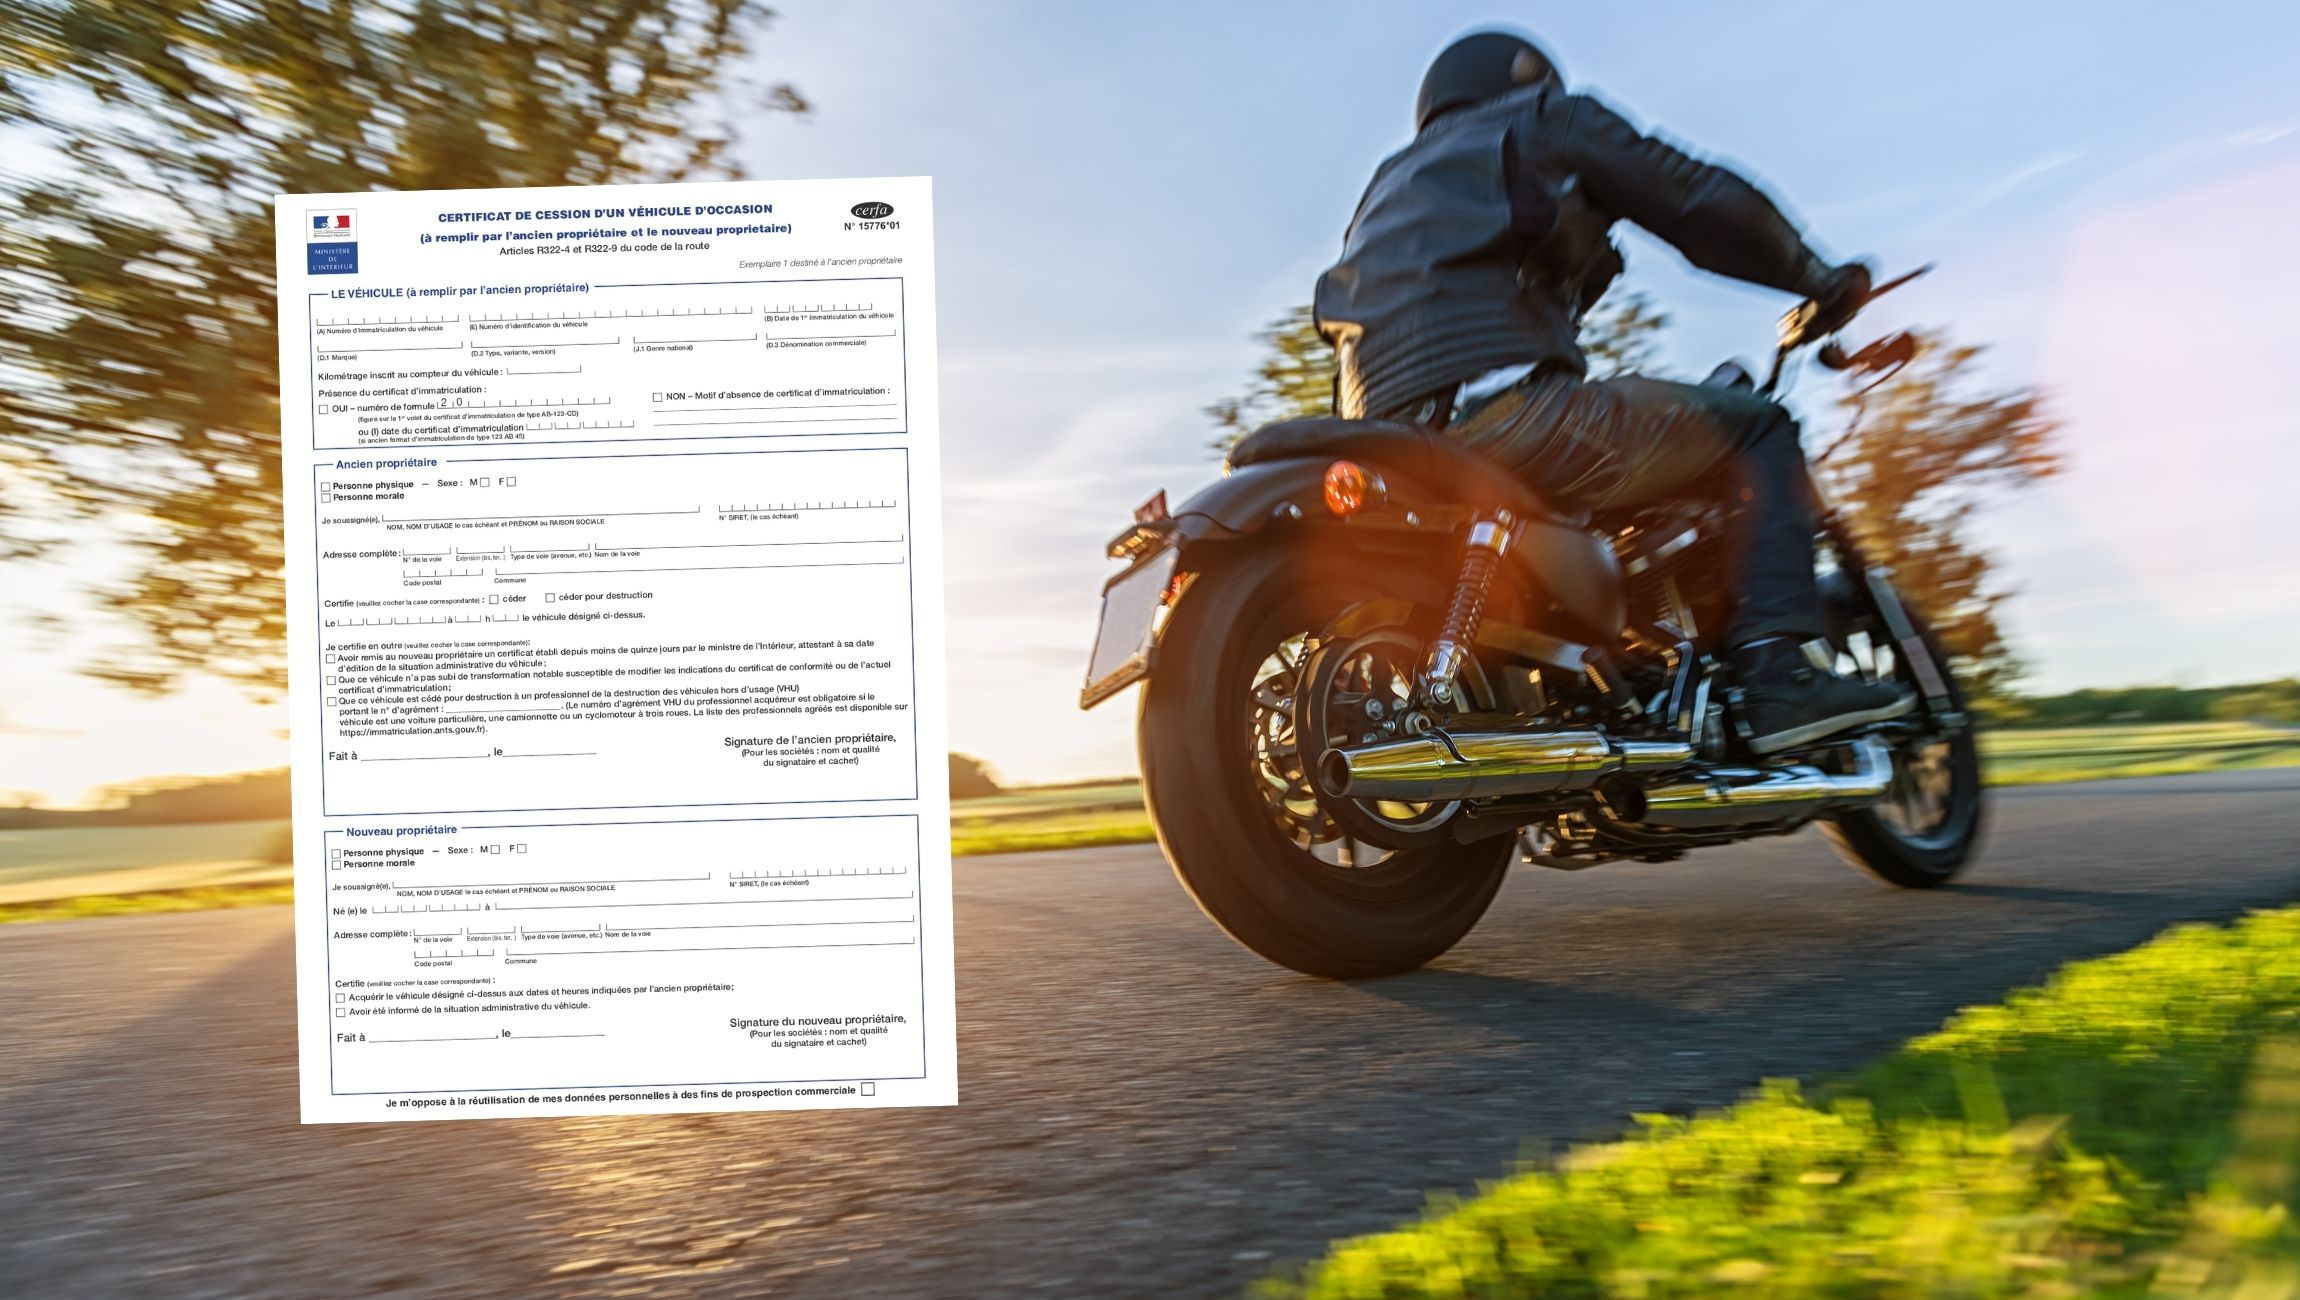 Certificat de cession moto